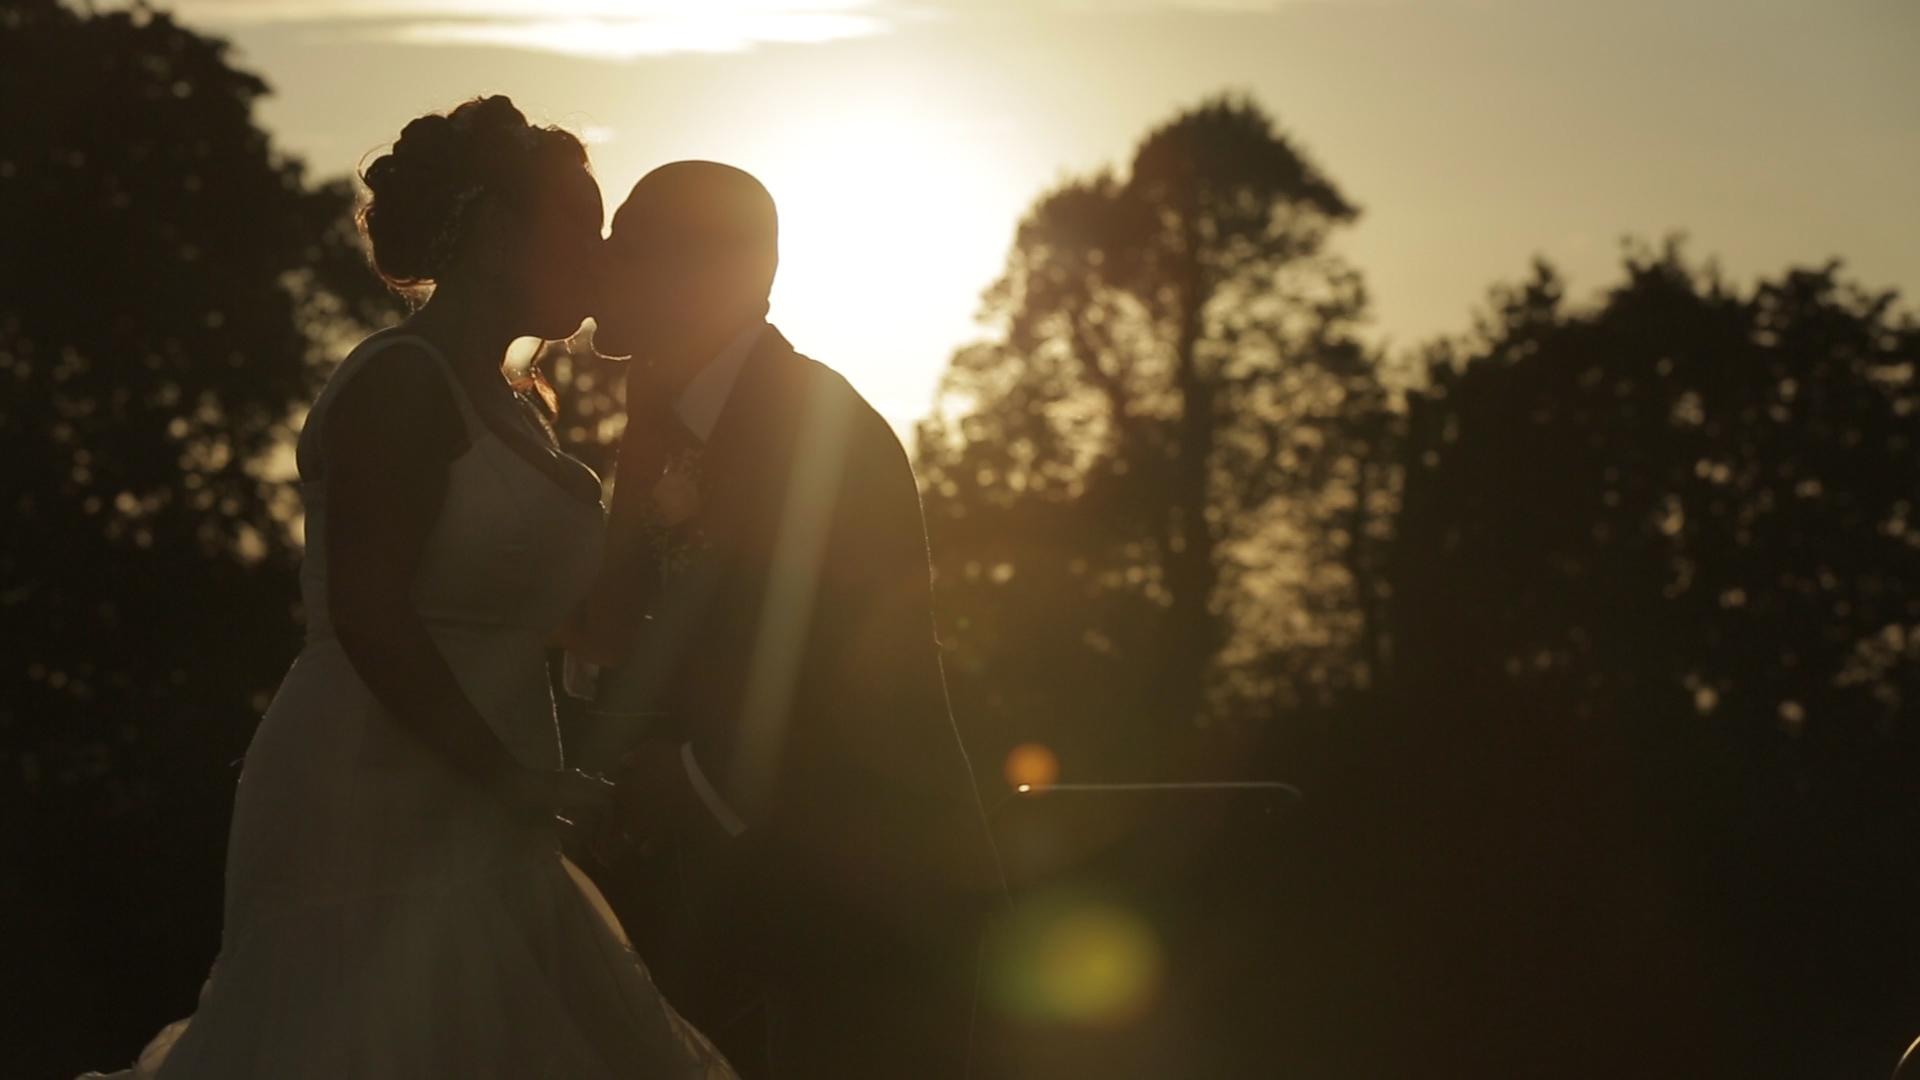 Richmond-park-sunset-wedding-kiss-pembroke-lodge